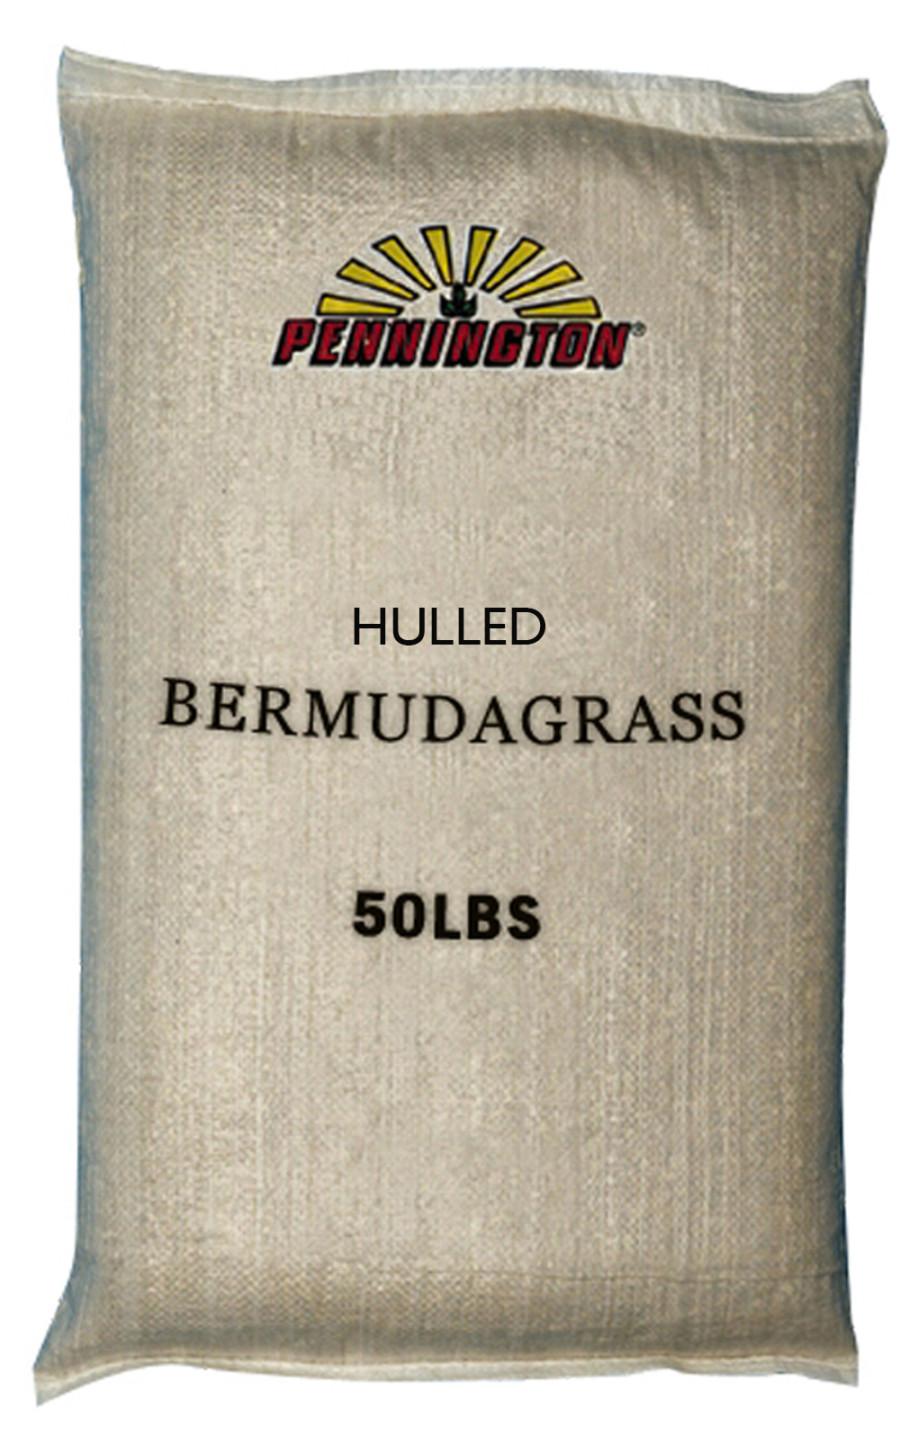 Pennington Bermudagrass Hulled 98/85 Blend 40ea/50 lb